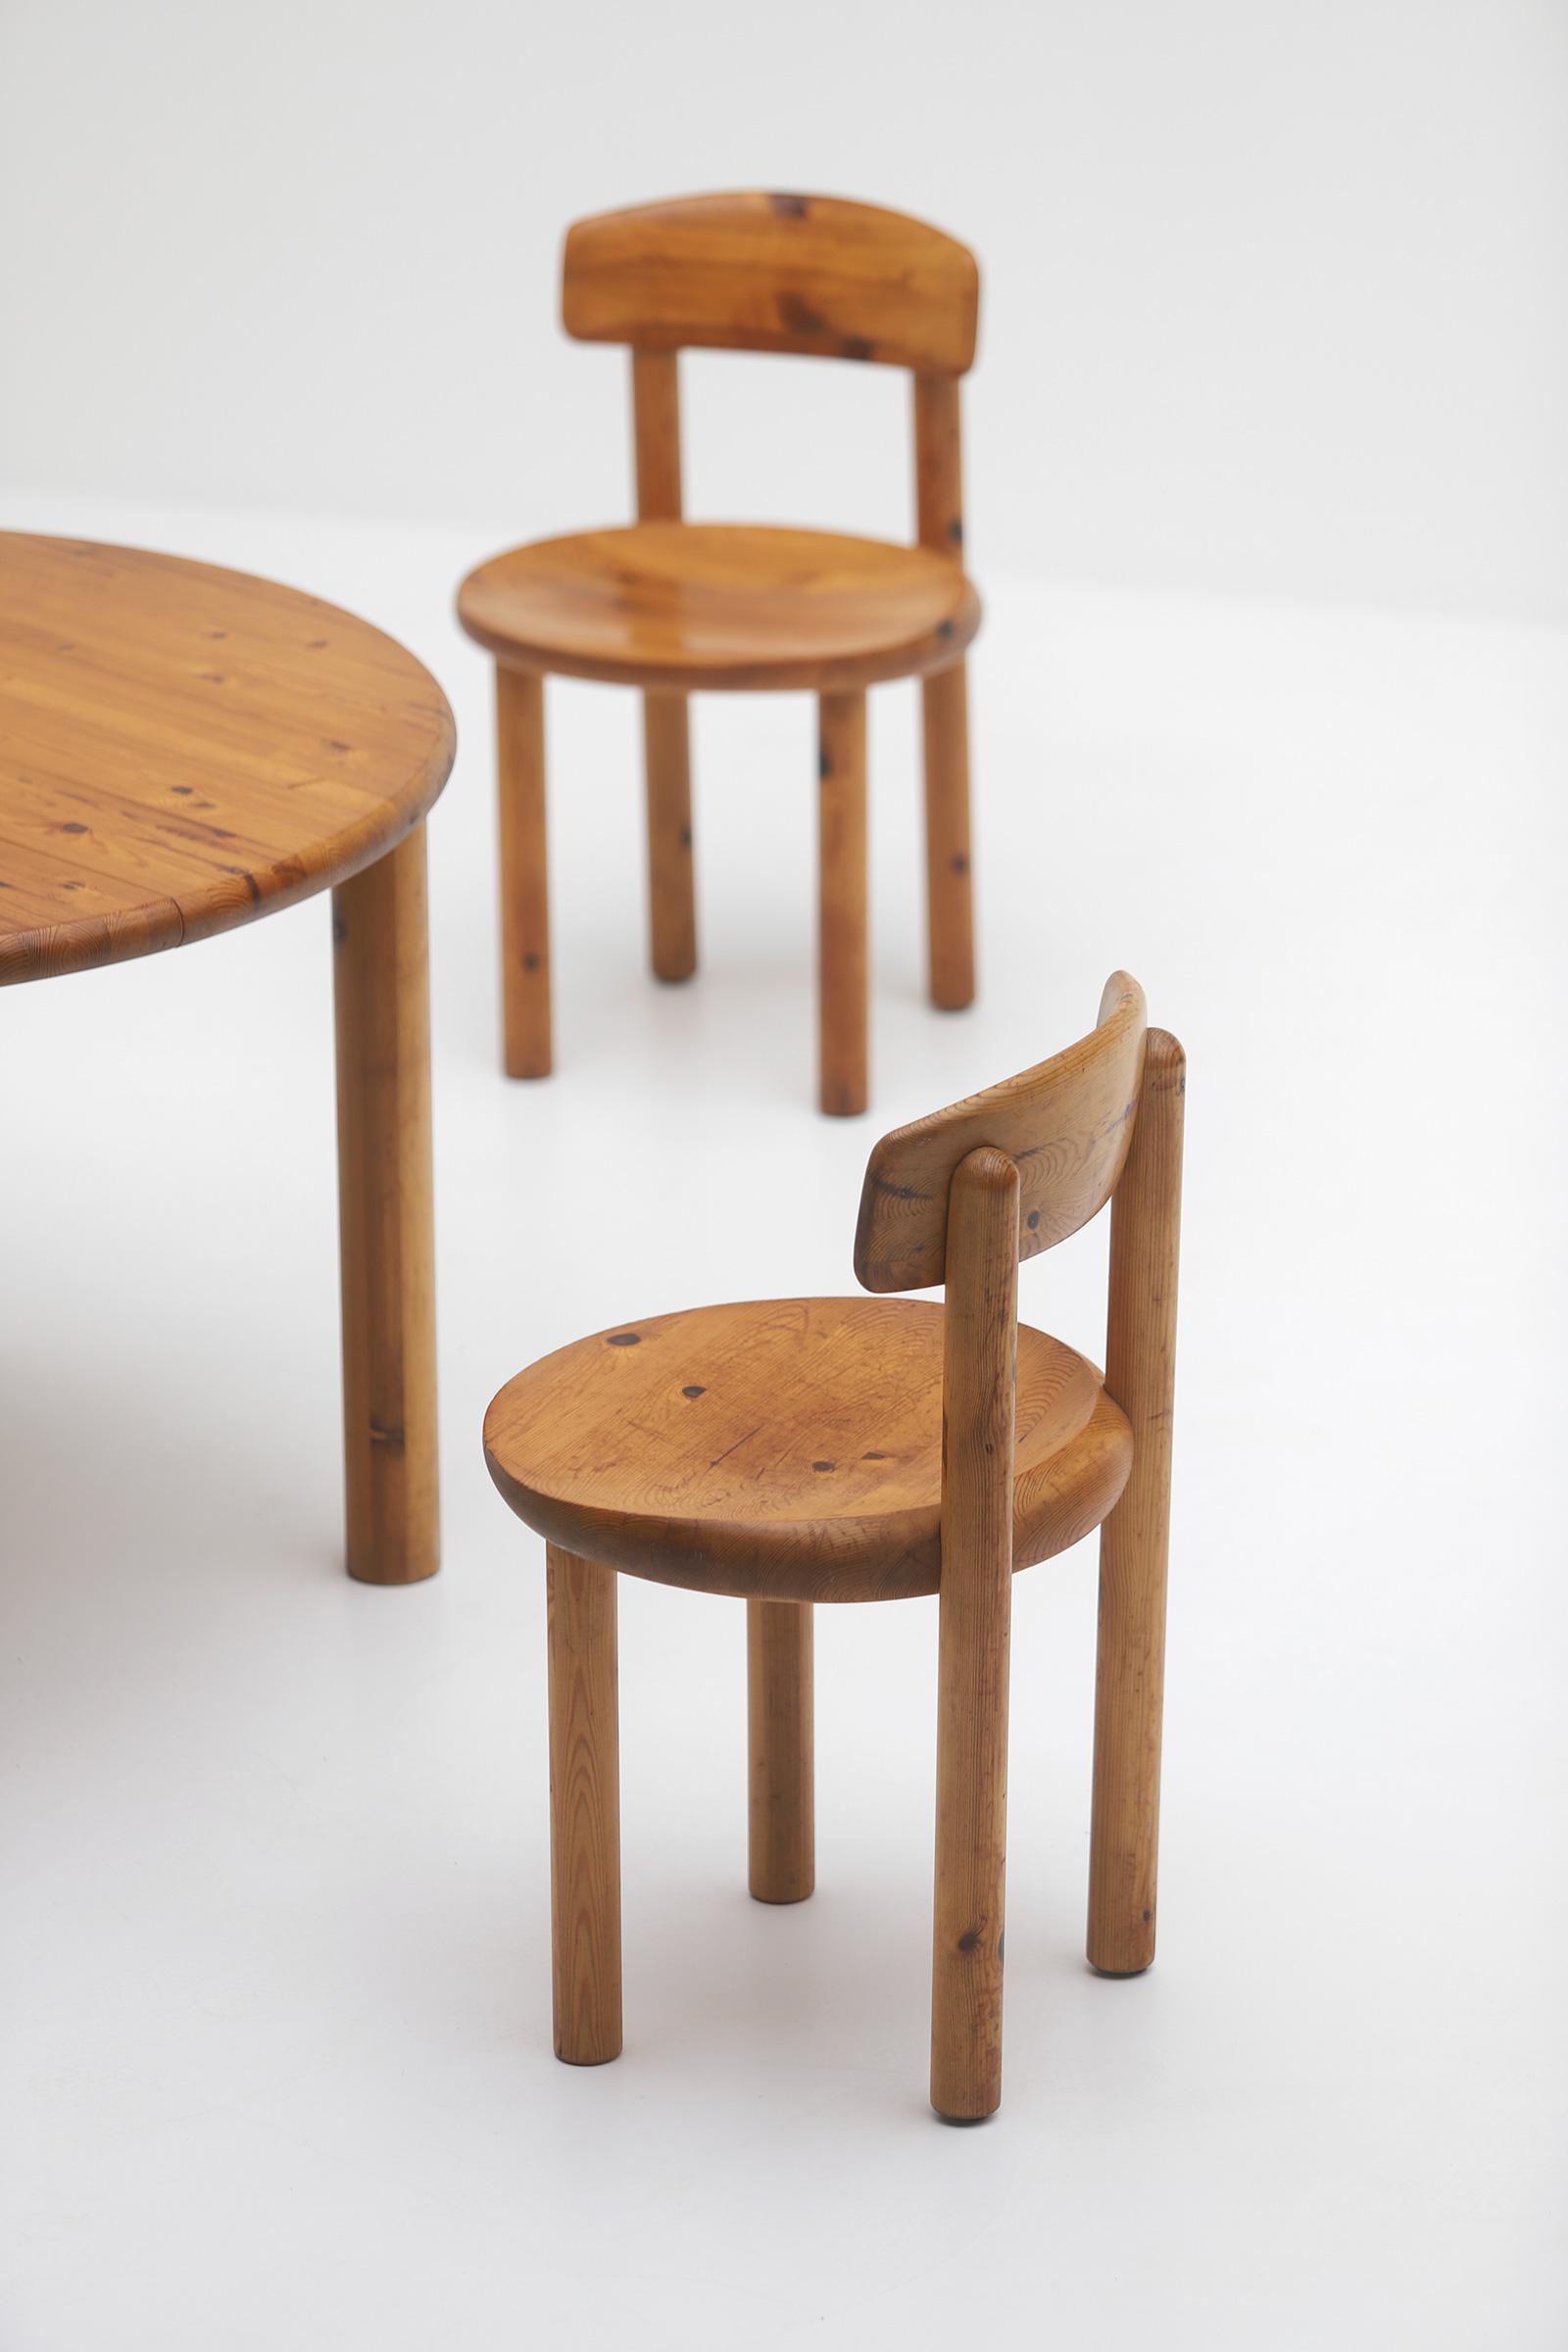 5 Daumiller Pinewood Chairsimage 4